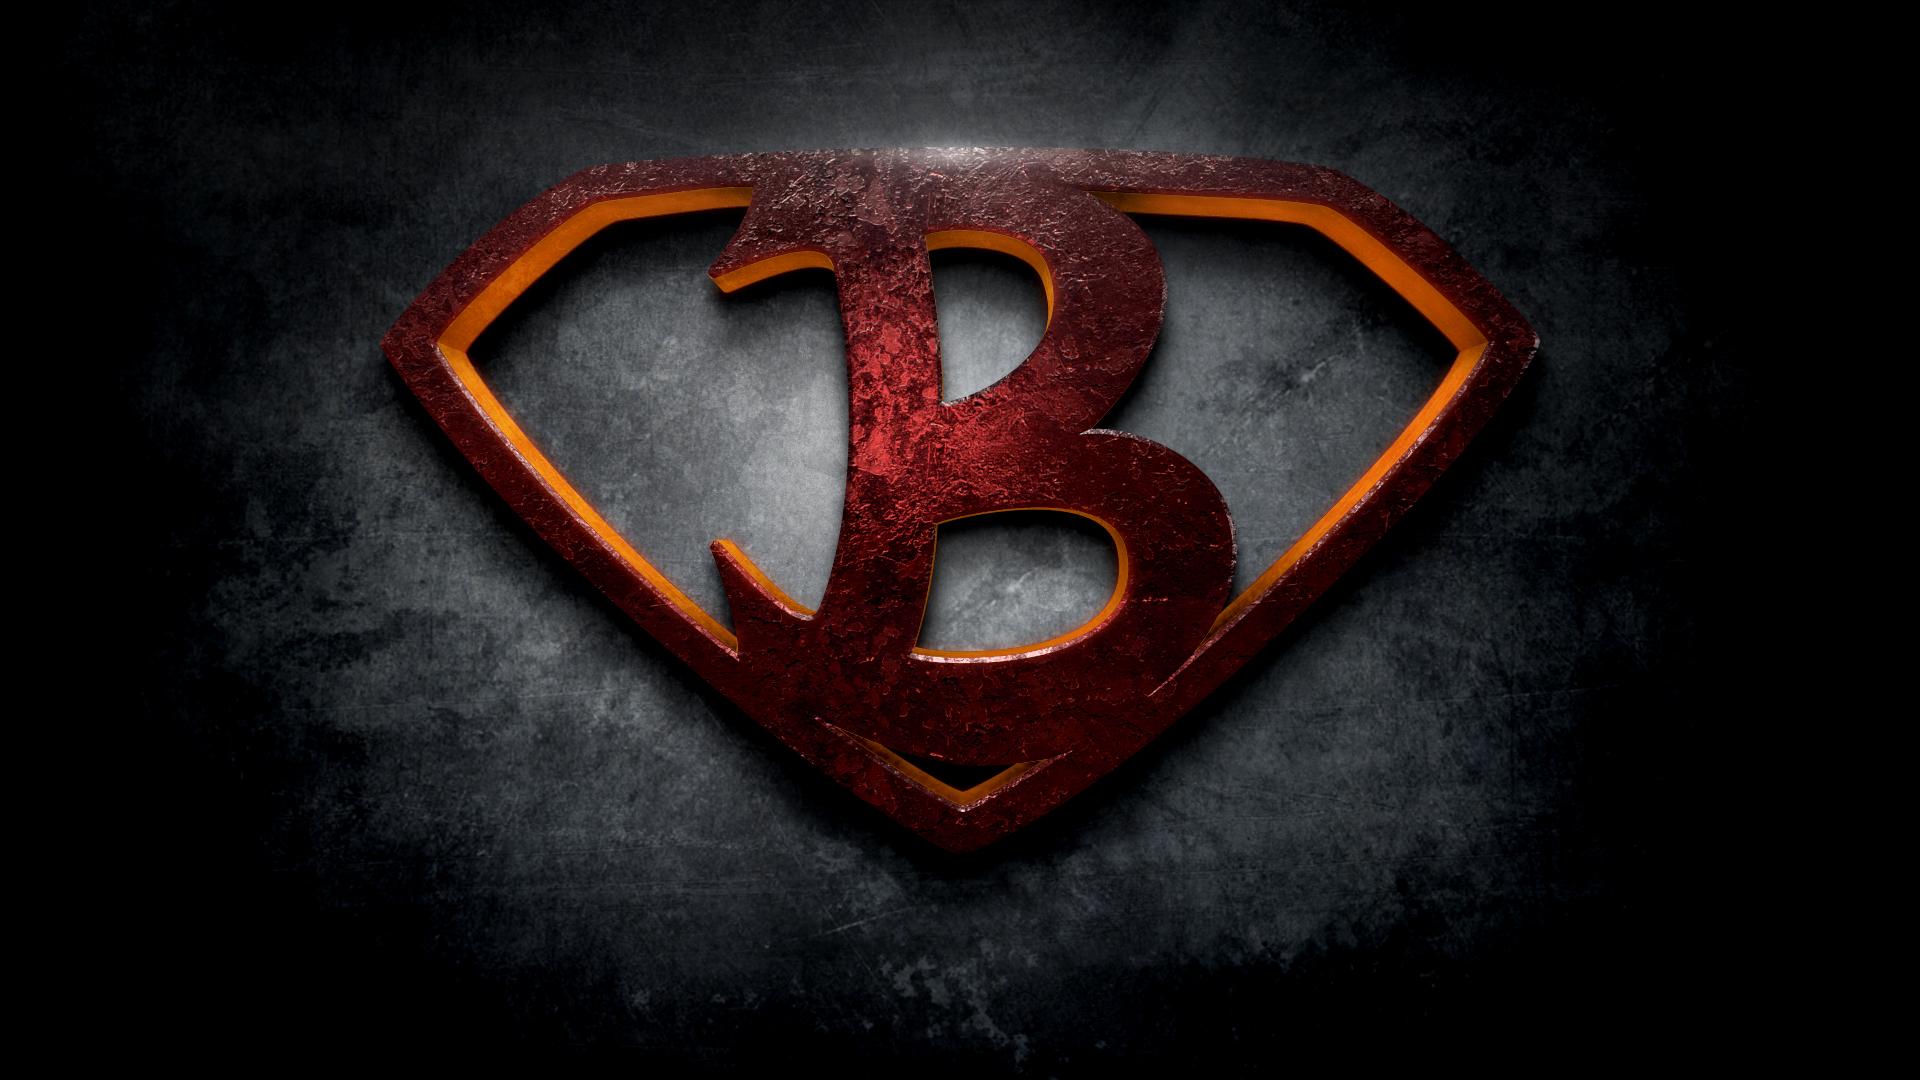 B Alphabet hd wallpaper image